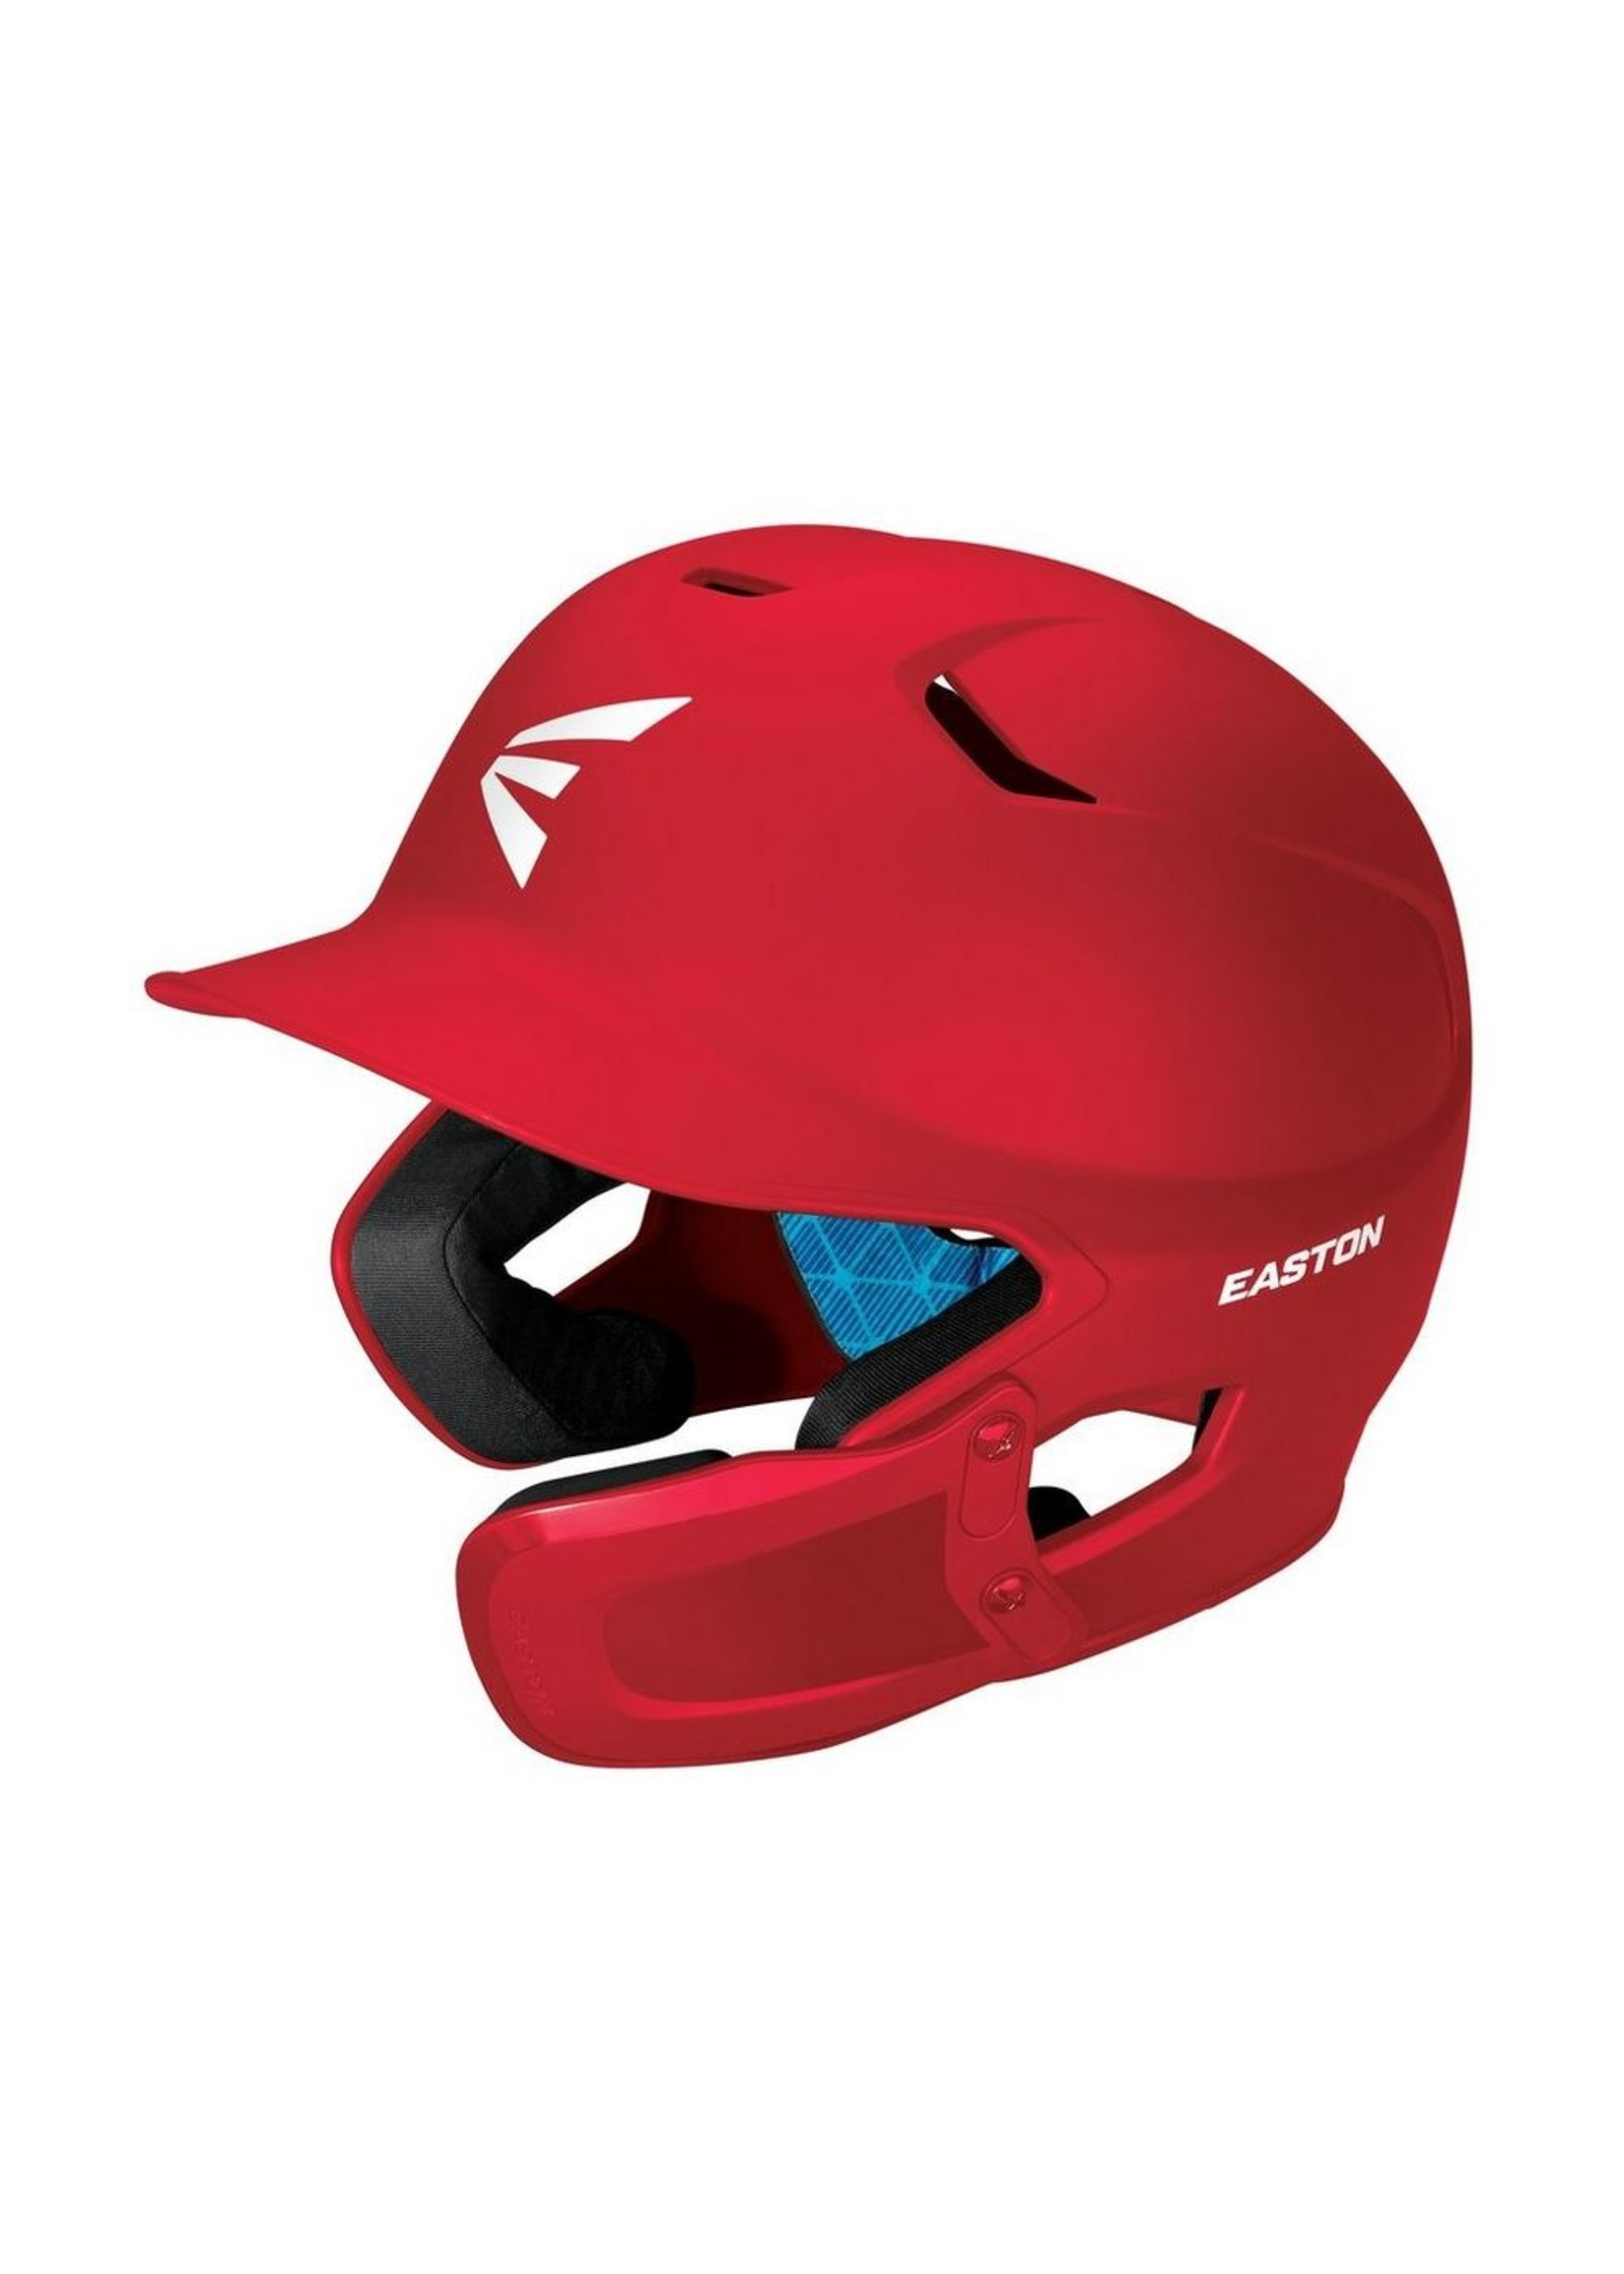 Easton Baseball (Canada) EASTON Z5 2.0 JAW GUARD SR HELMET